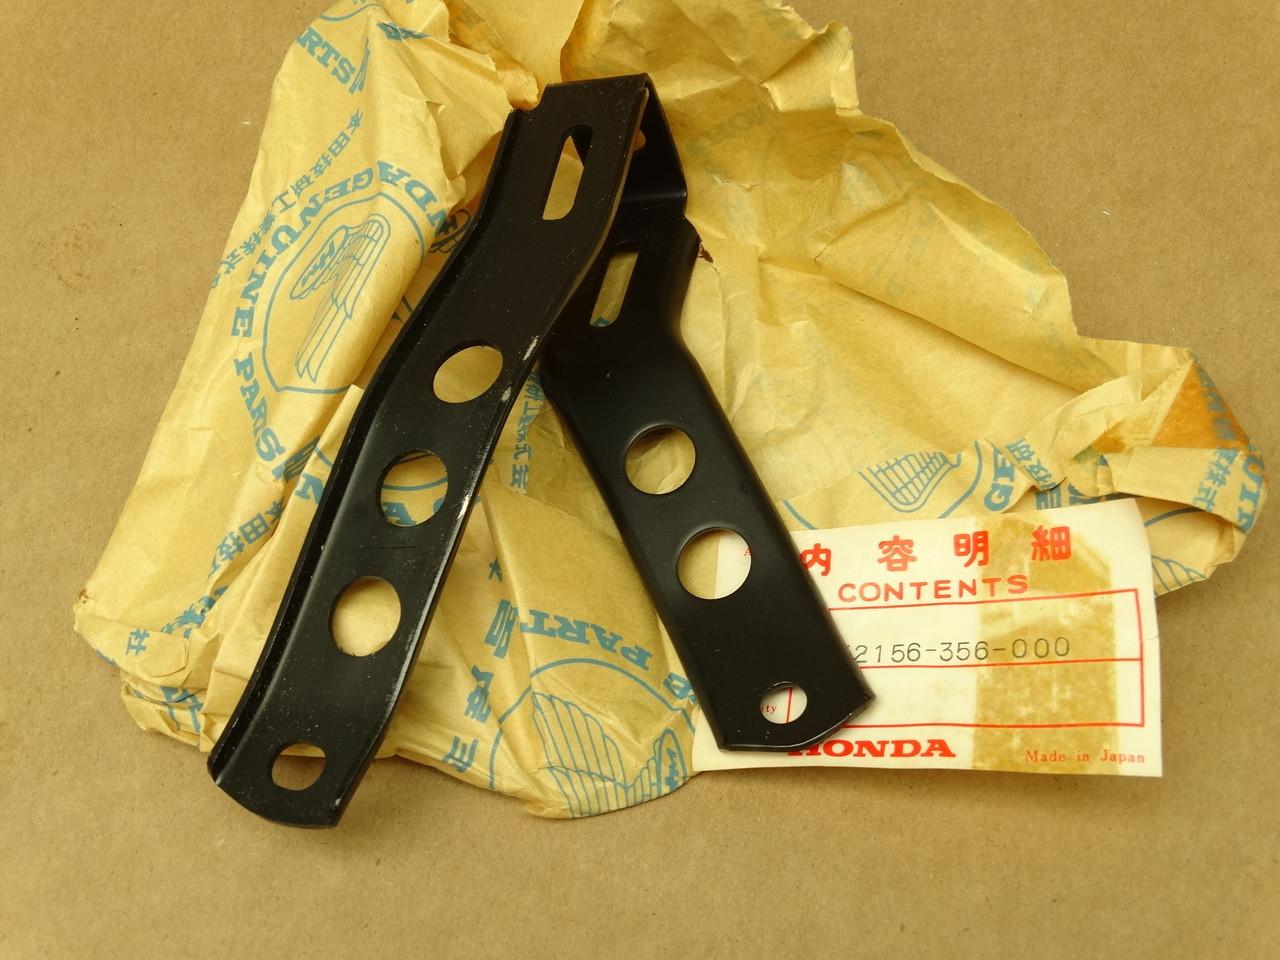 NOS Honda XL250 K1-K2 XL350 K0-K1 Chain Guide Guard 52156-356-000